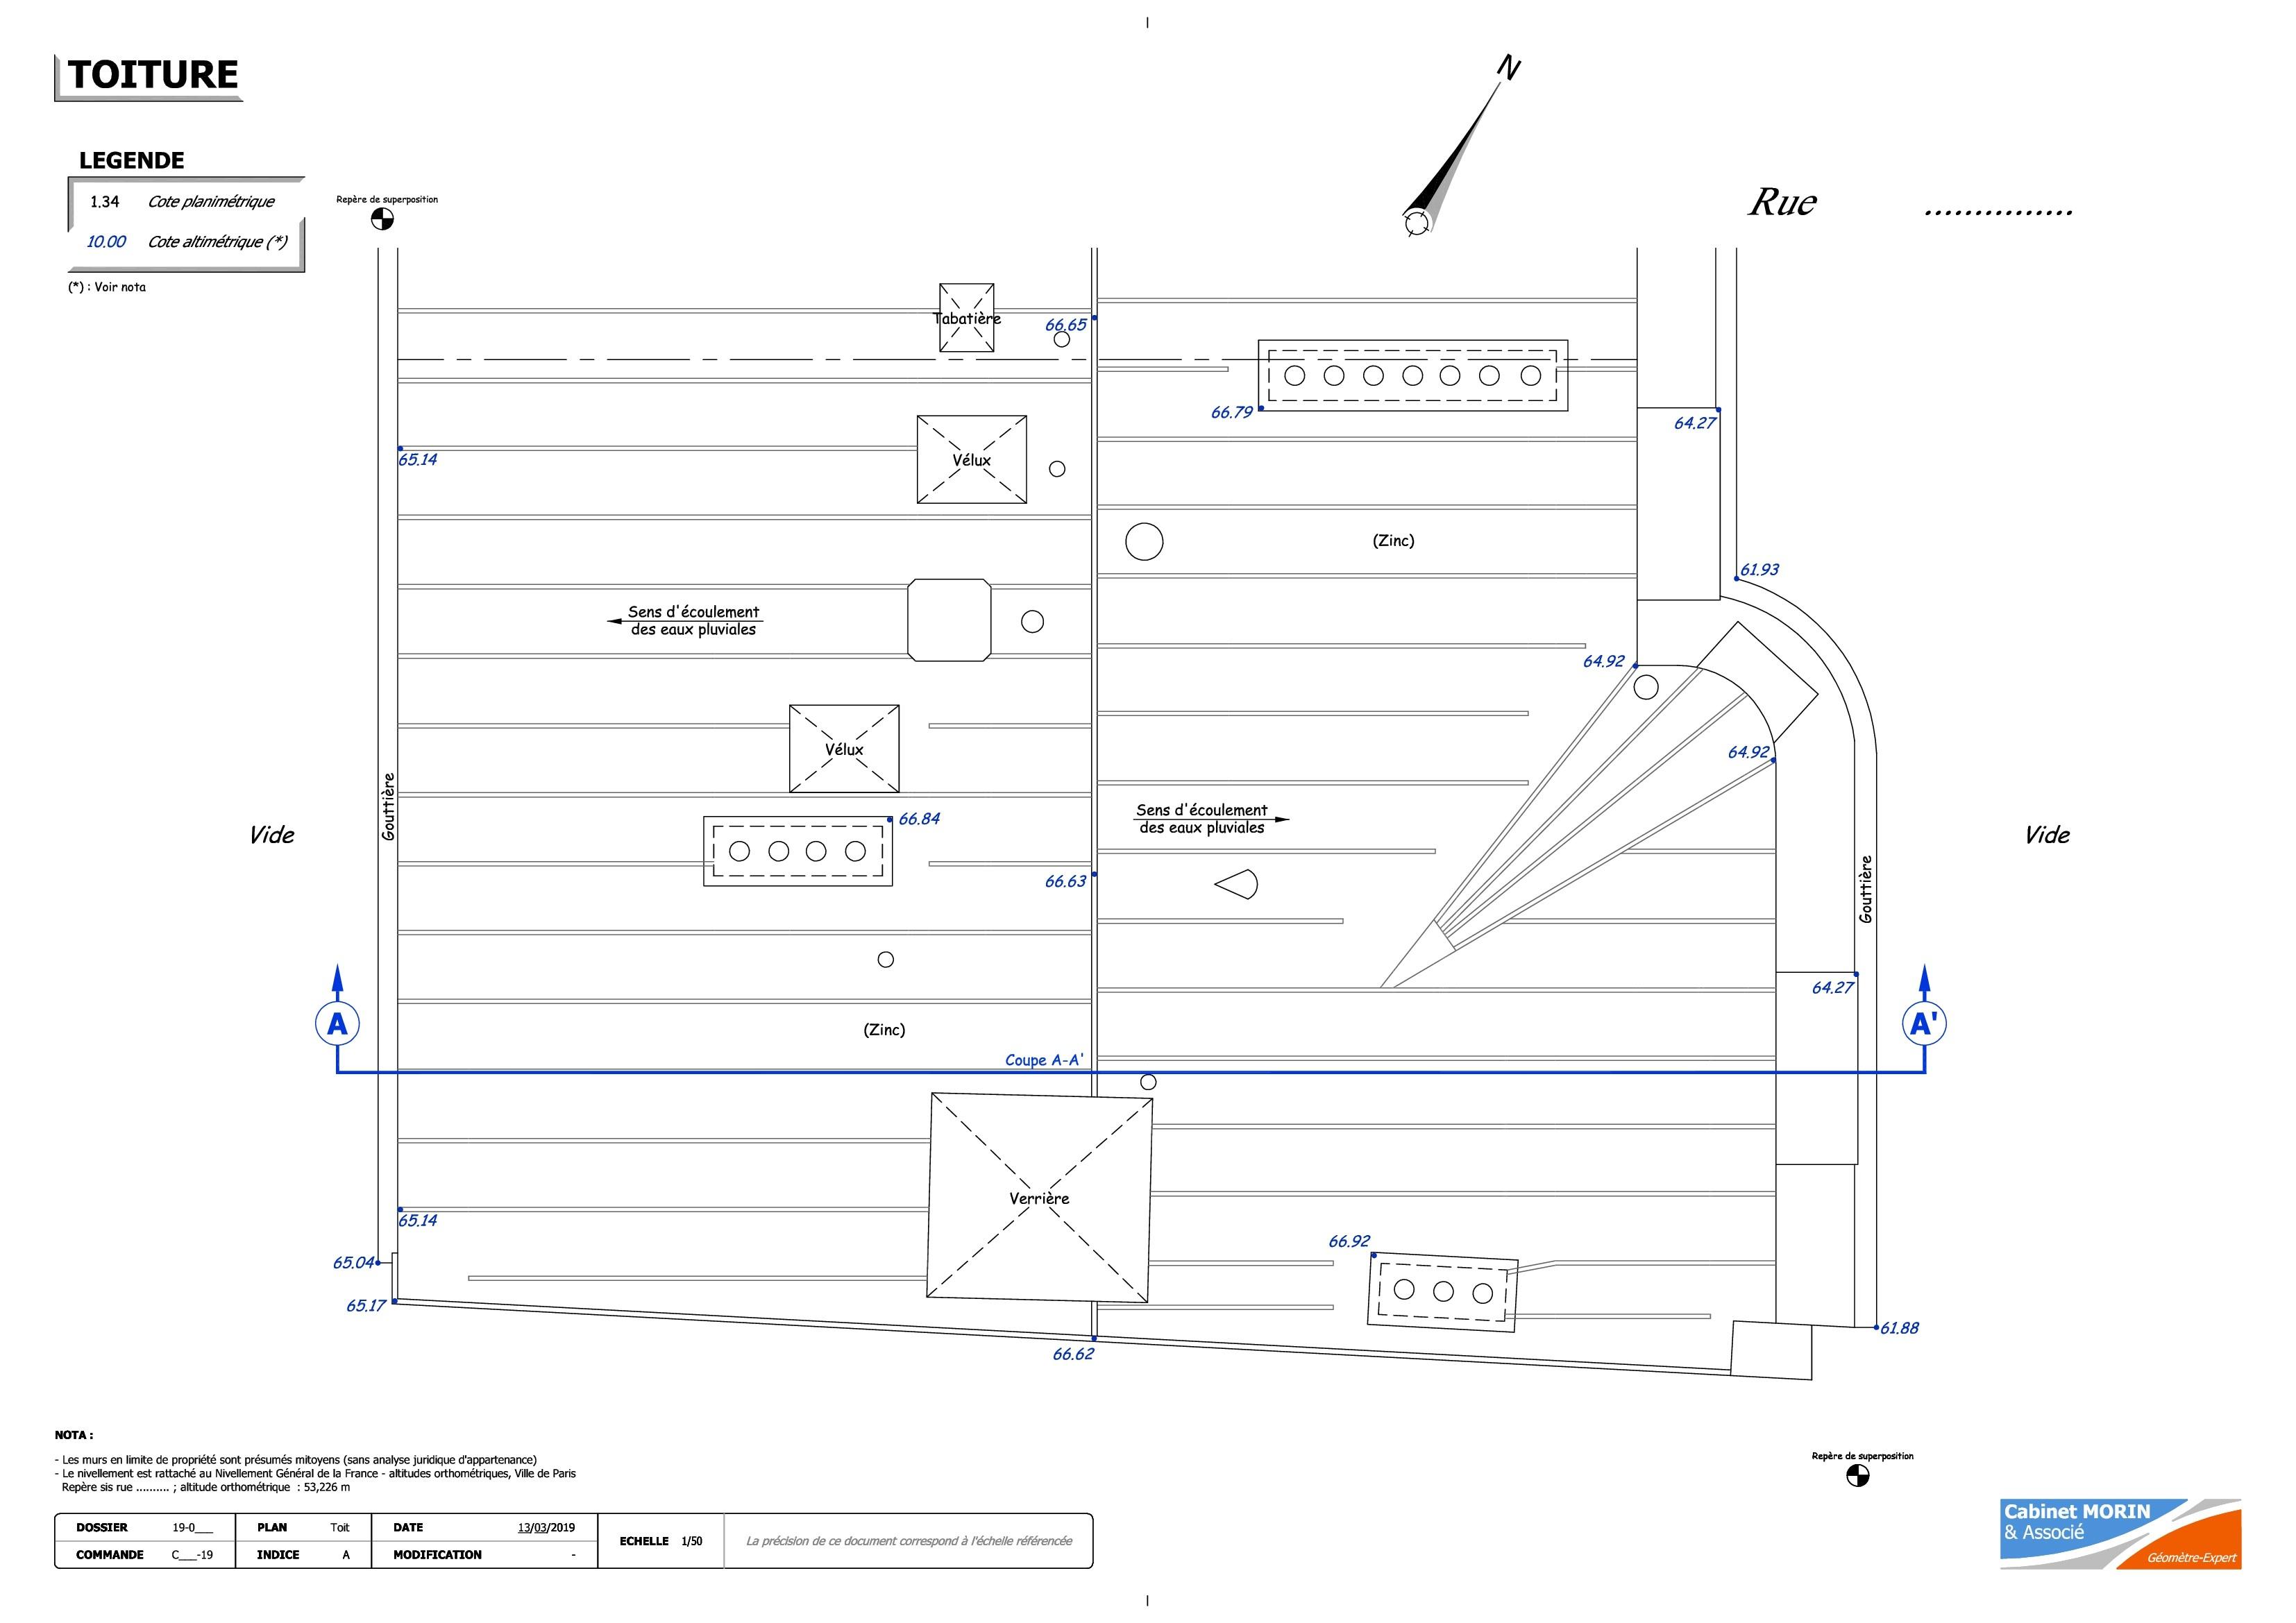 Plan de toiture - CABINET MORIN & ASSOCIE